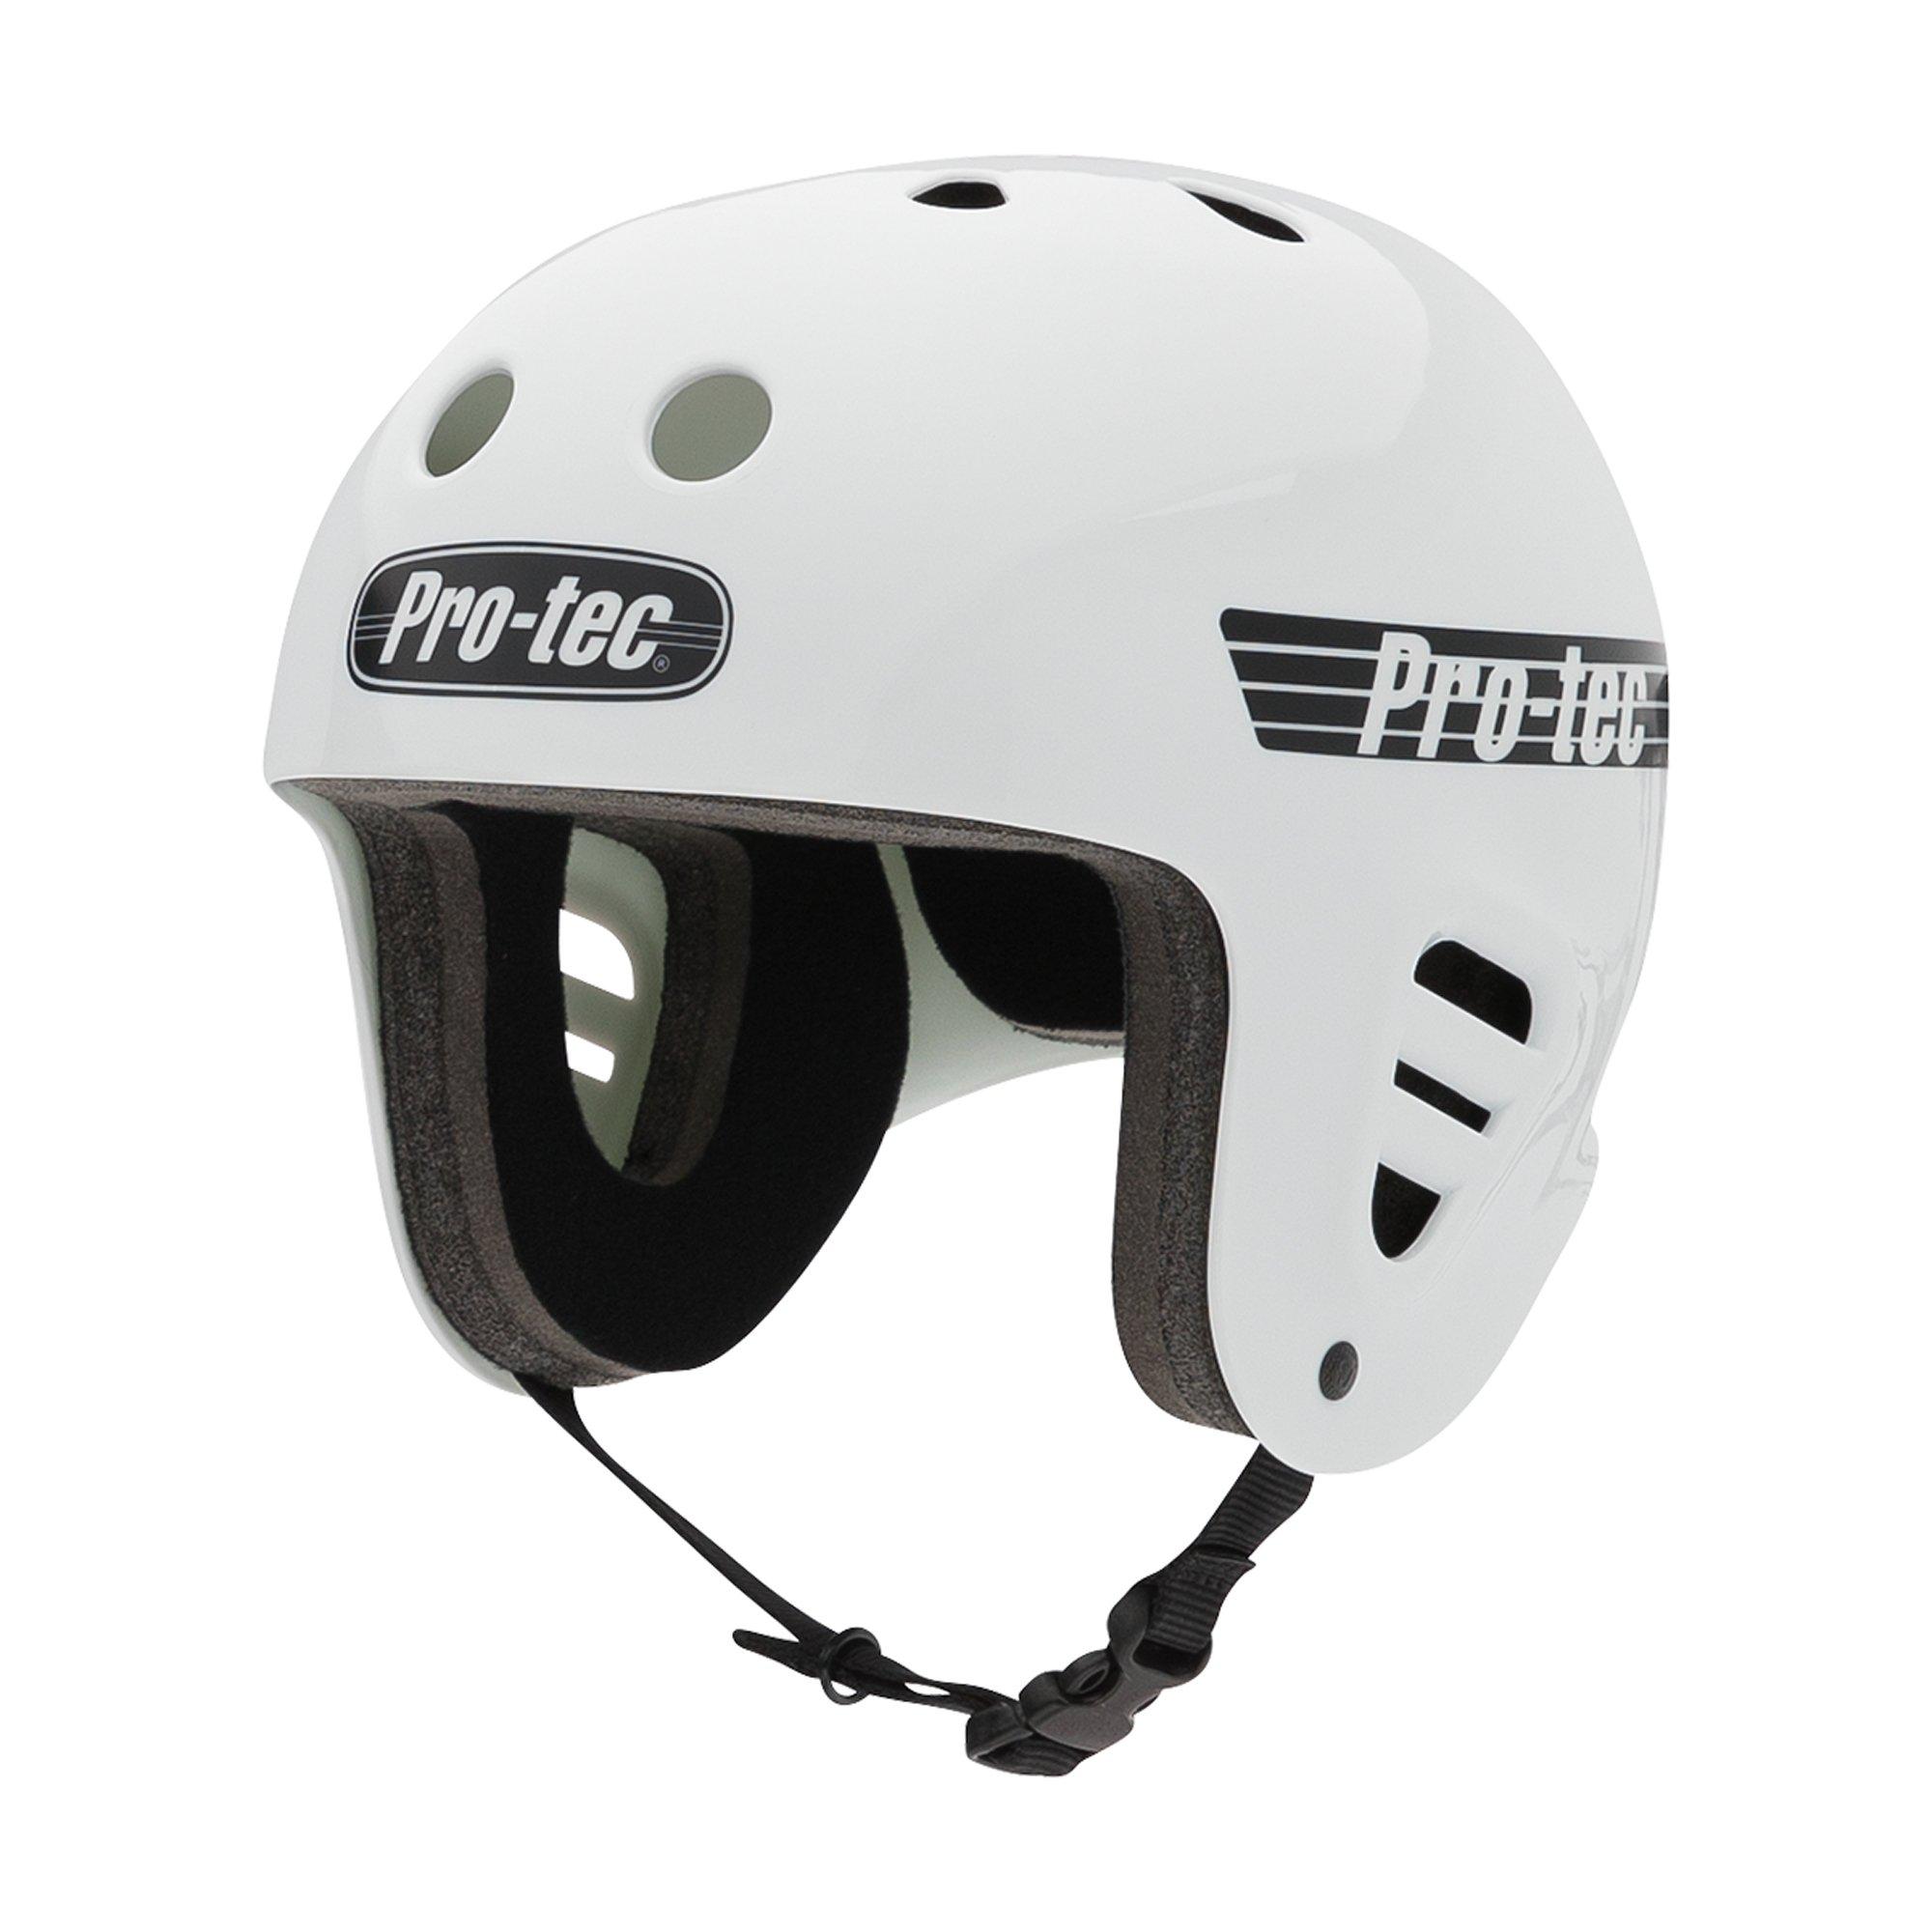 Pro-Tec Full Cut Skate Helmet by Pro-Tec